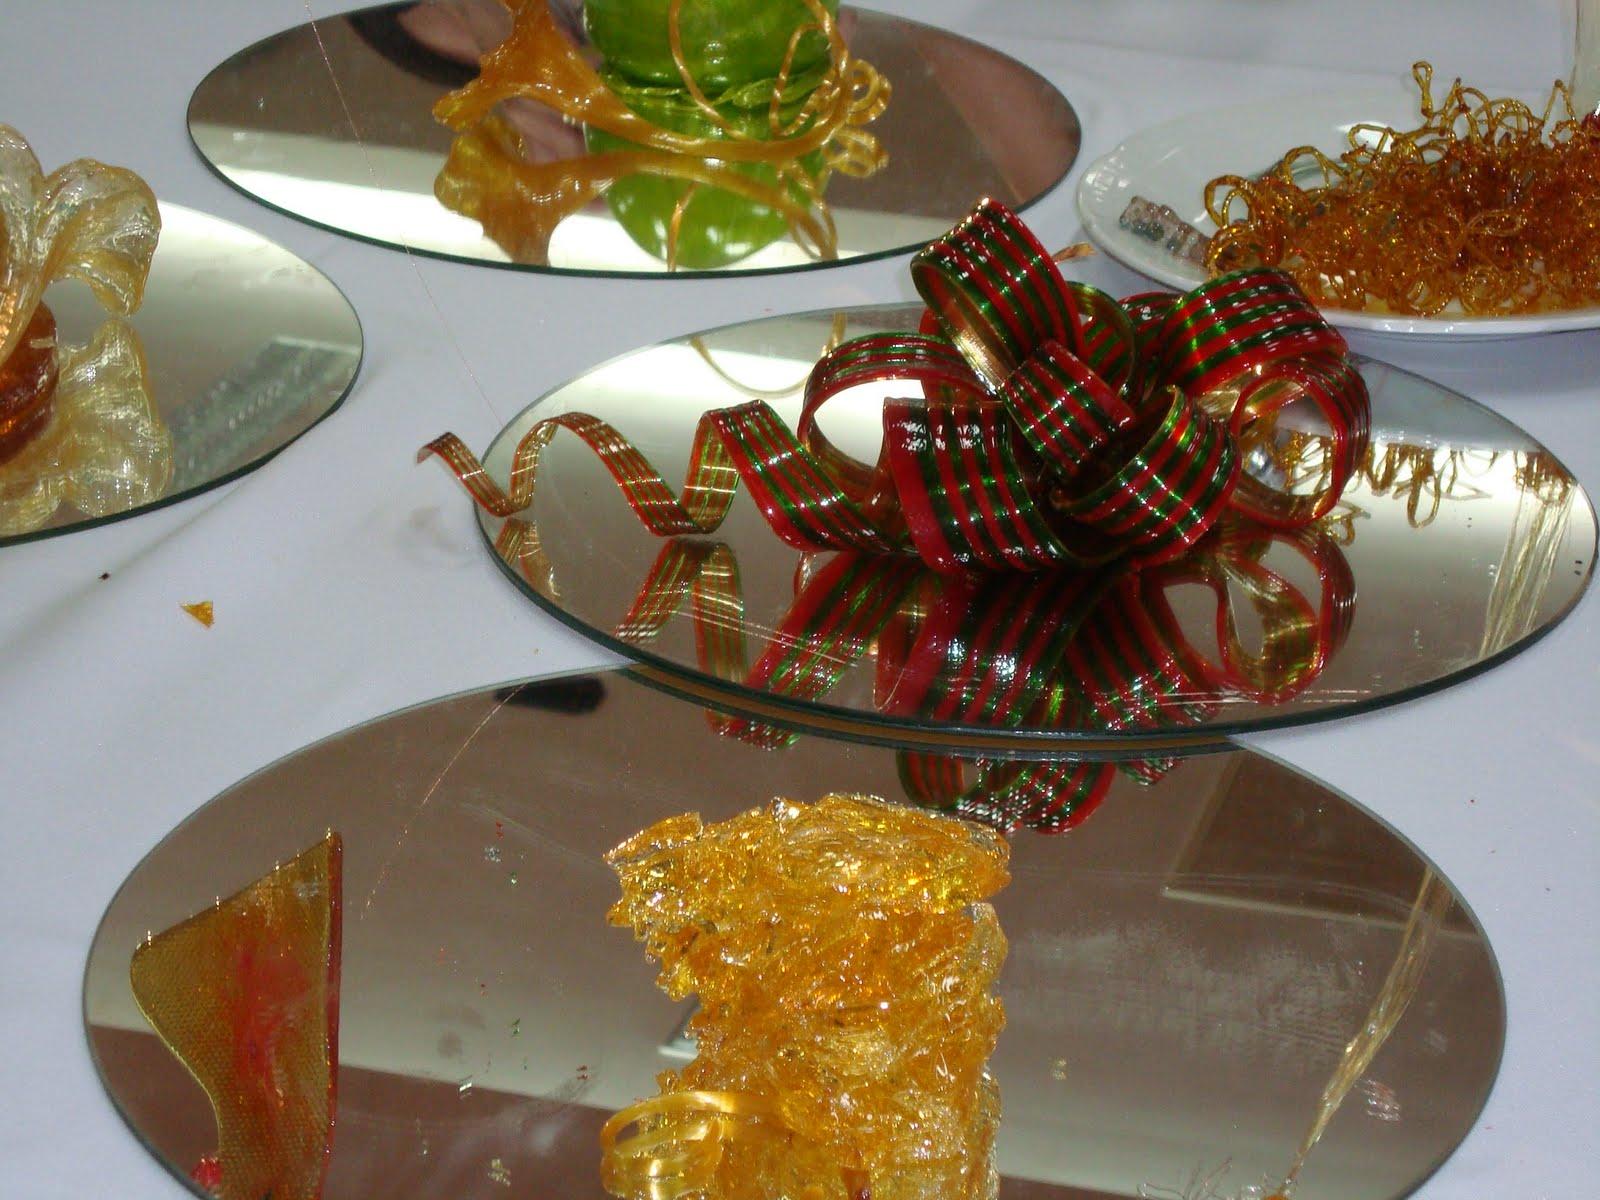 Cocina en casa como hacer adornos de caramelo for Como hacer adornos para la casa